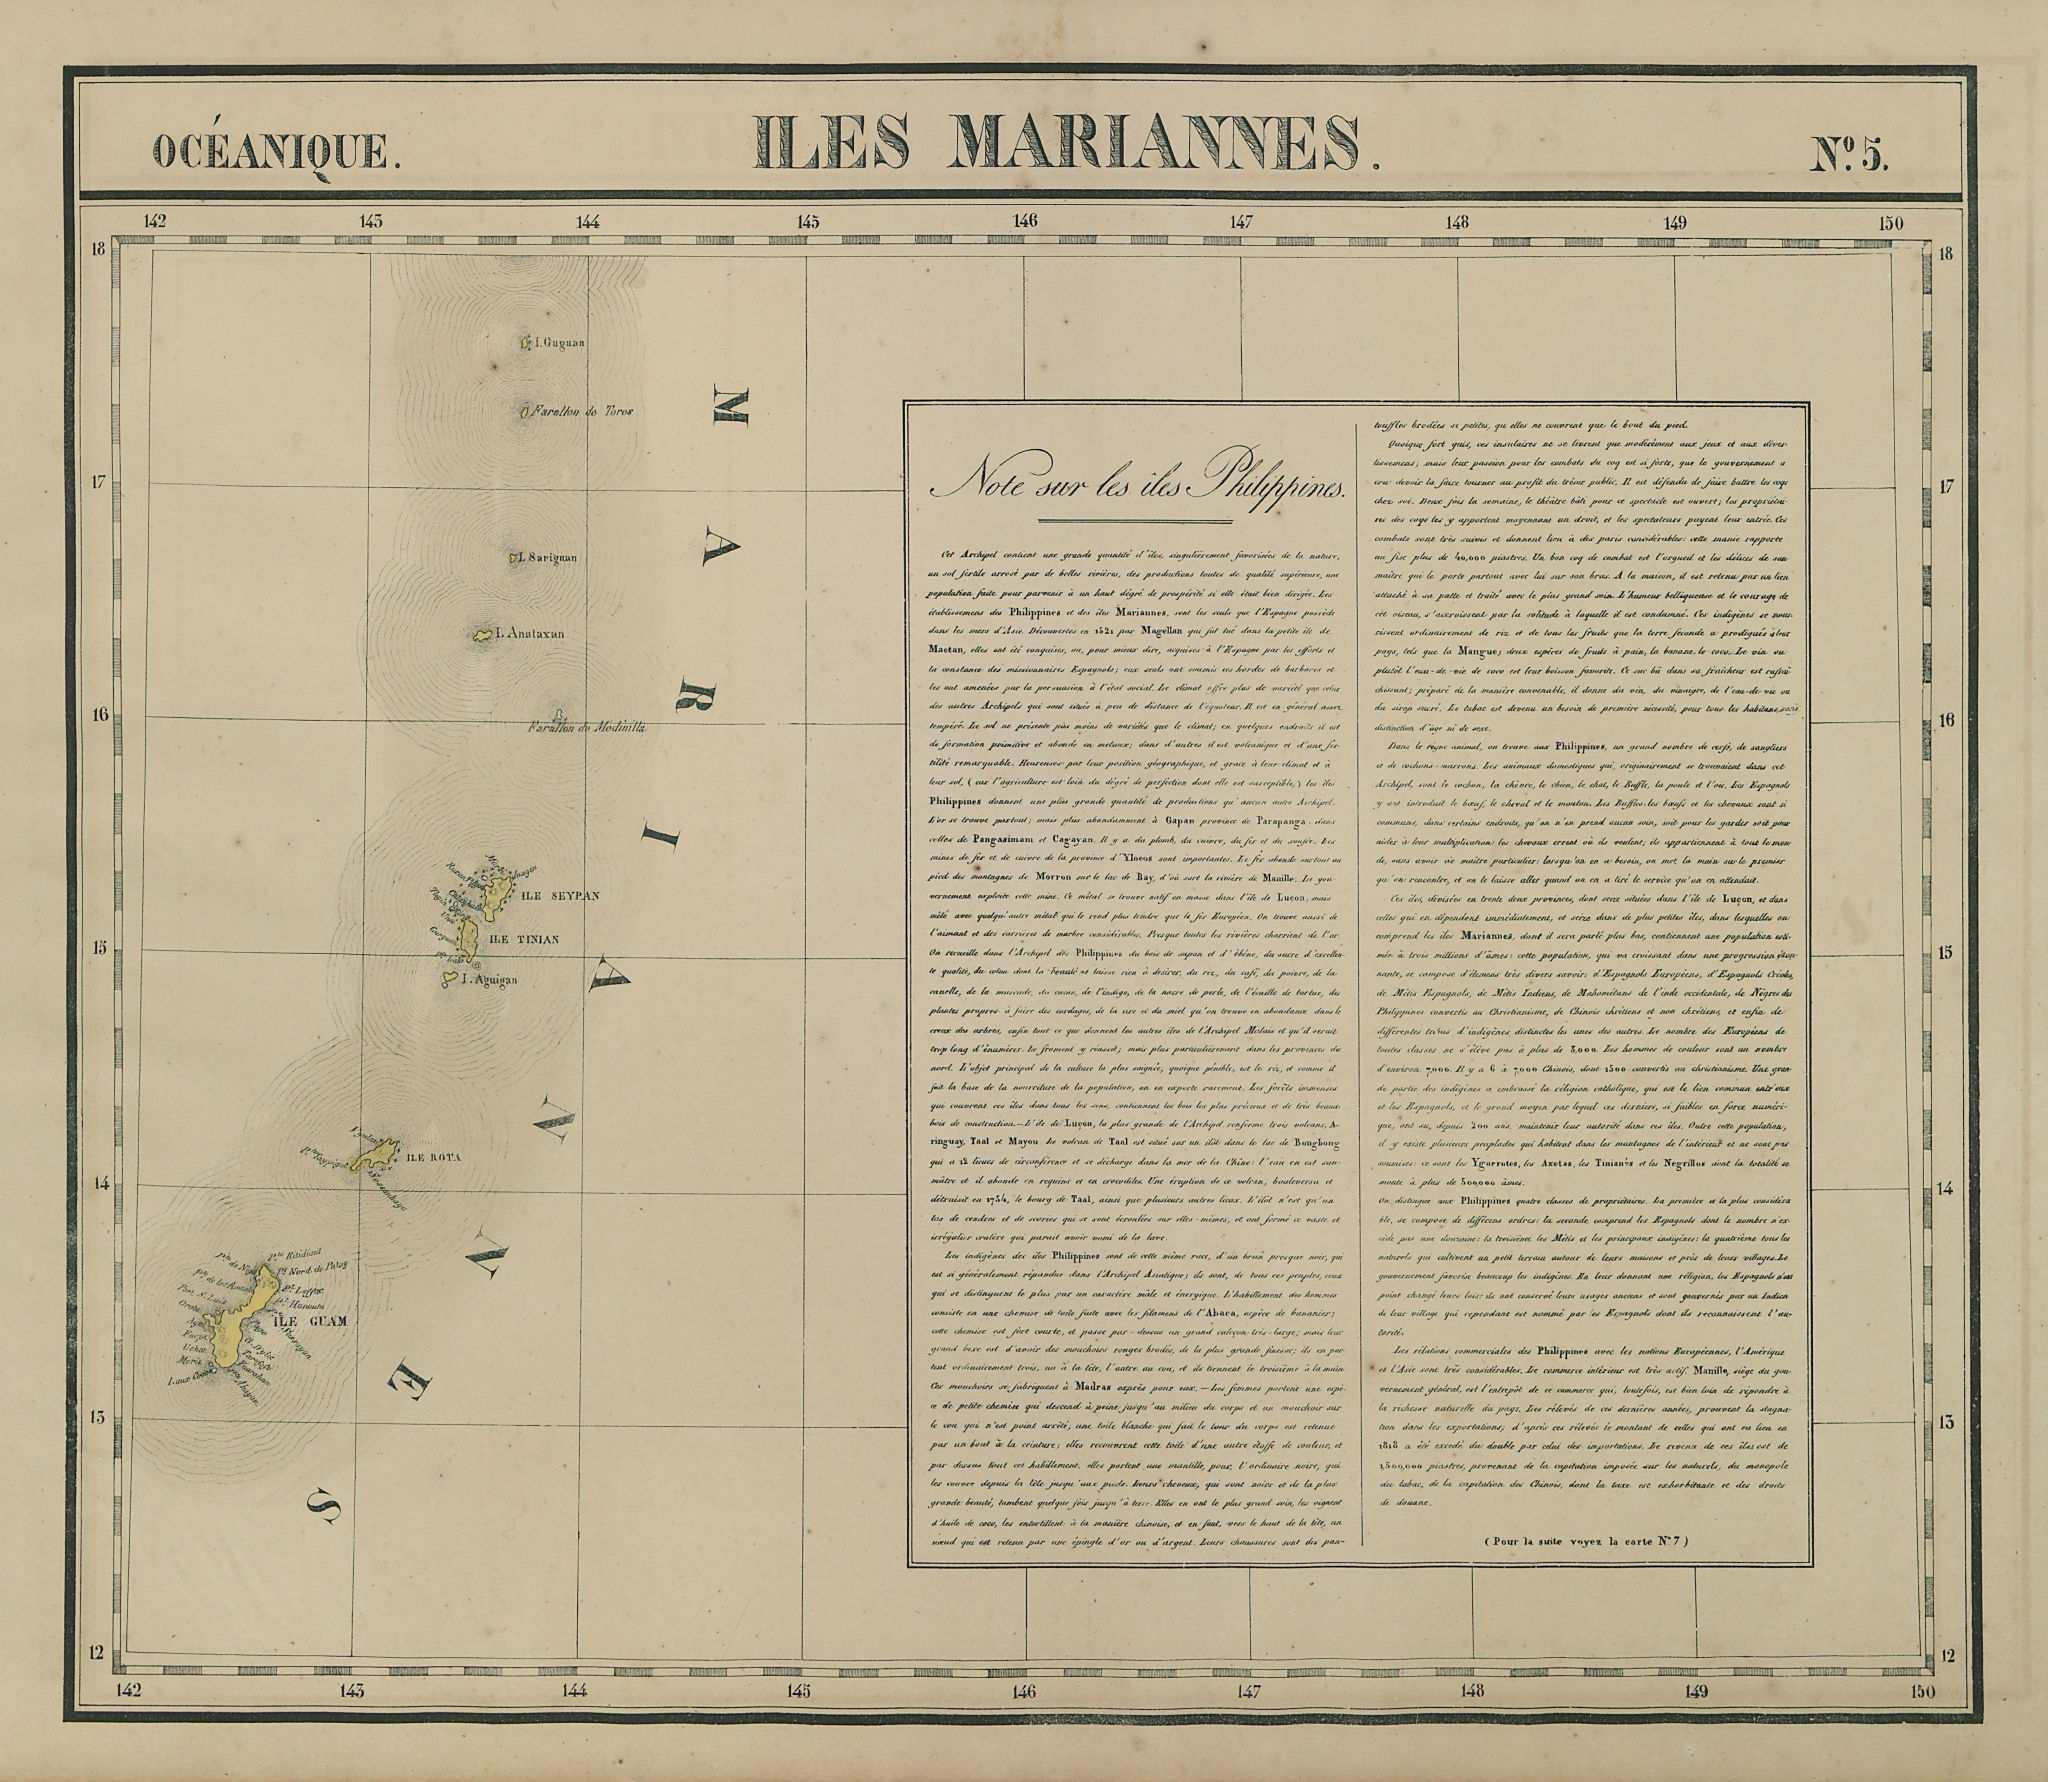 Océanique. Iles Mariannes #5. Mariana Islands Guam Saipan. VANDERMAELEN 1827 map